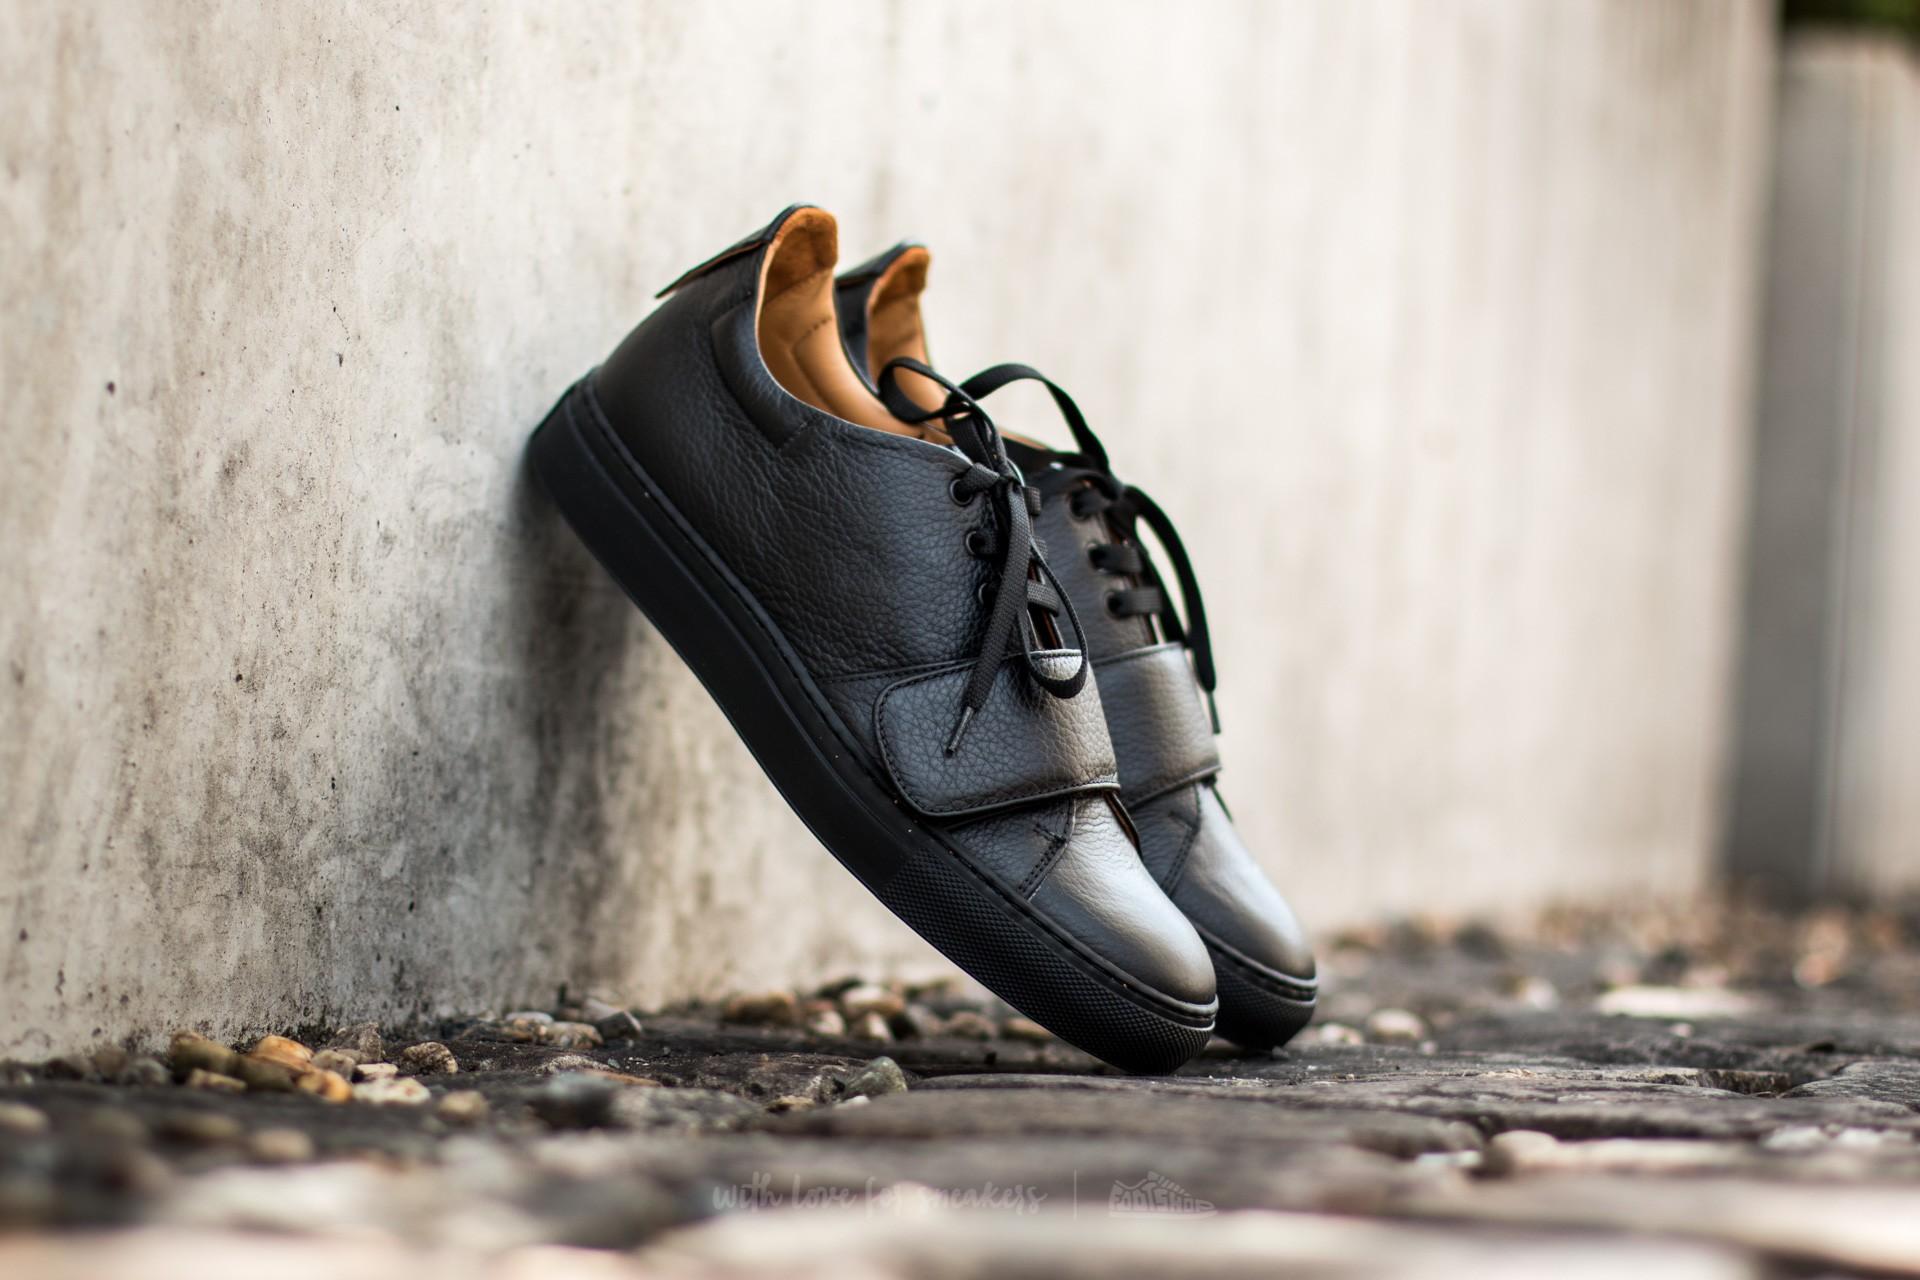 Marco Laganà Sneaker Strap Black Leather - Black Sole